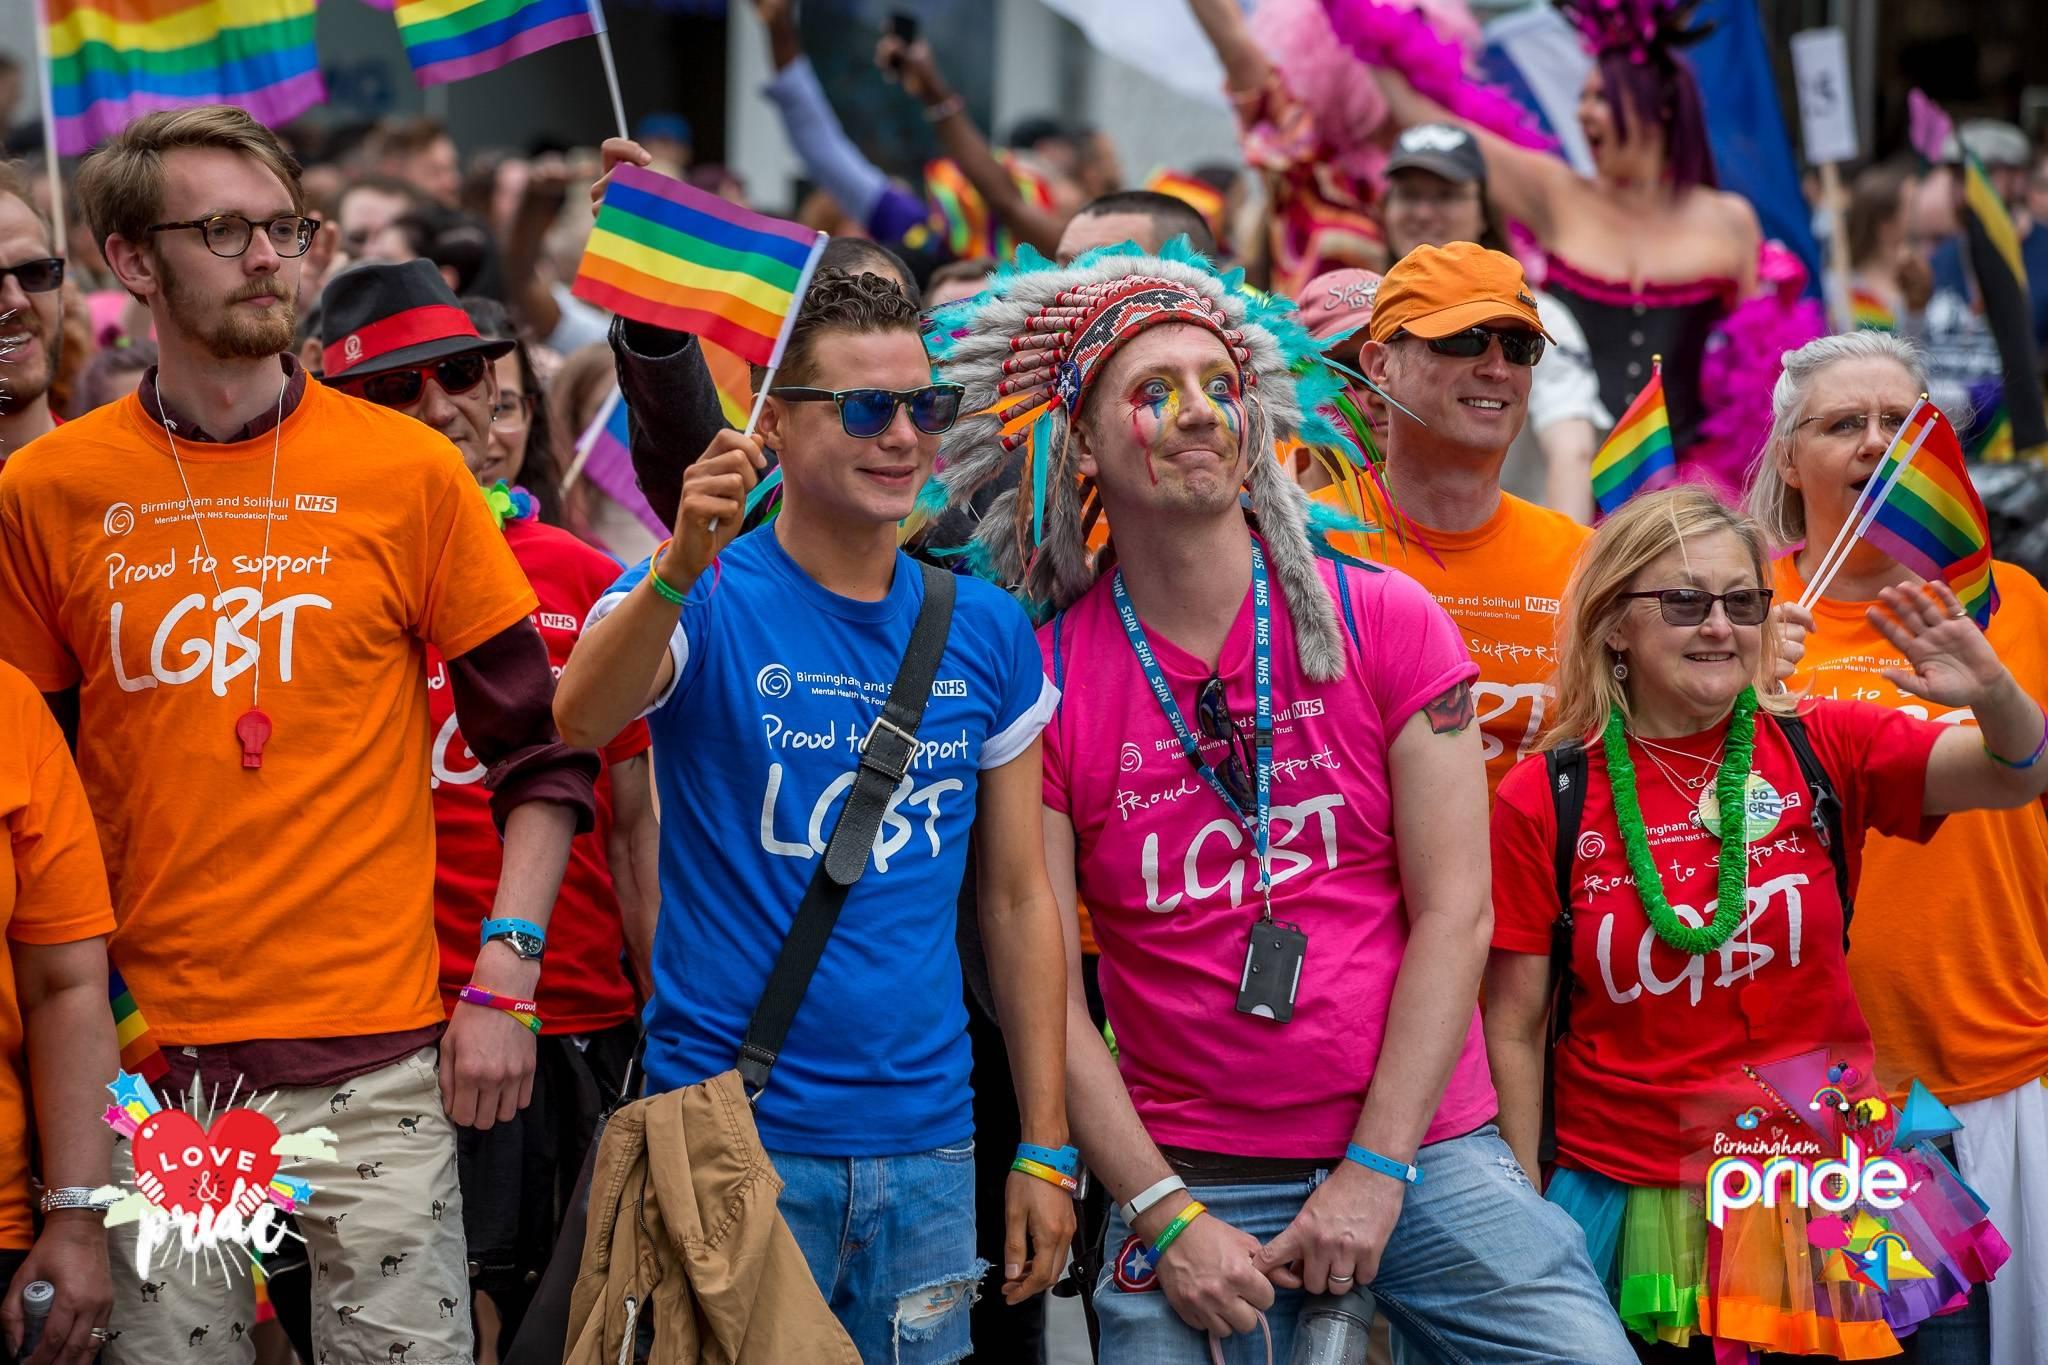 Birmingham Gay Pride 2019: dates, parade, route - misterb&b